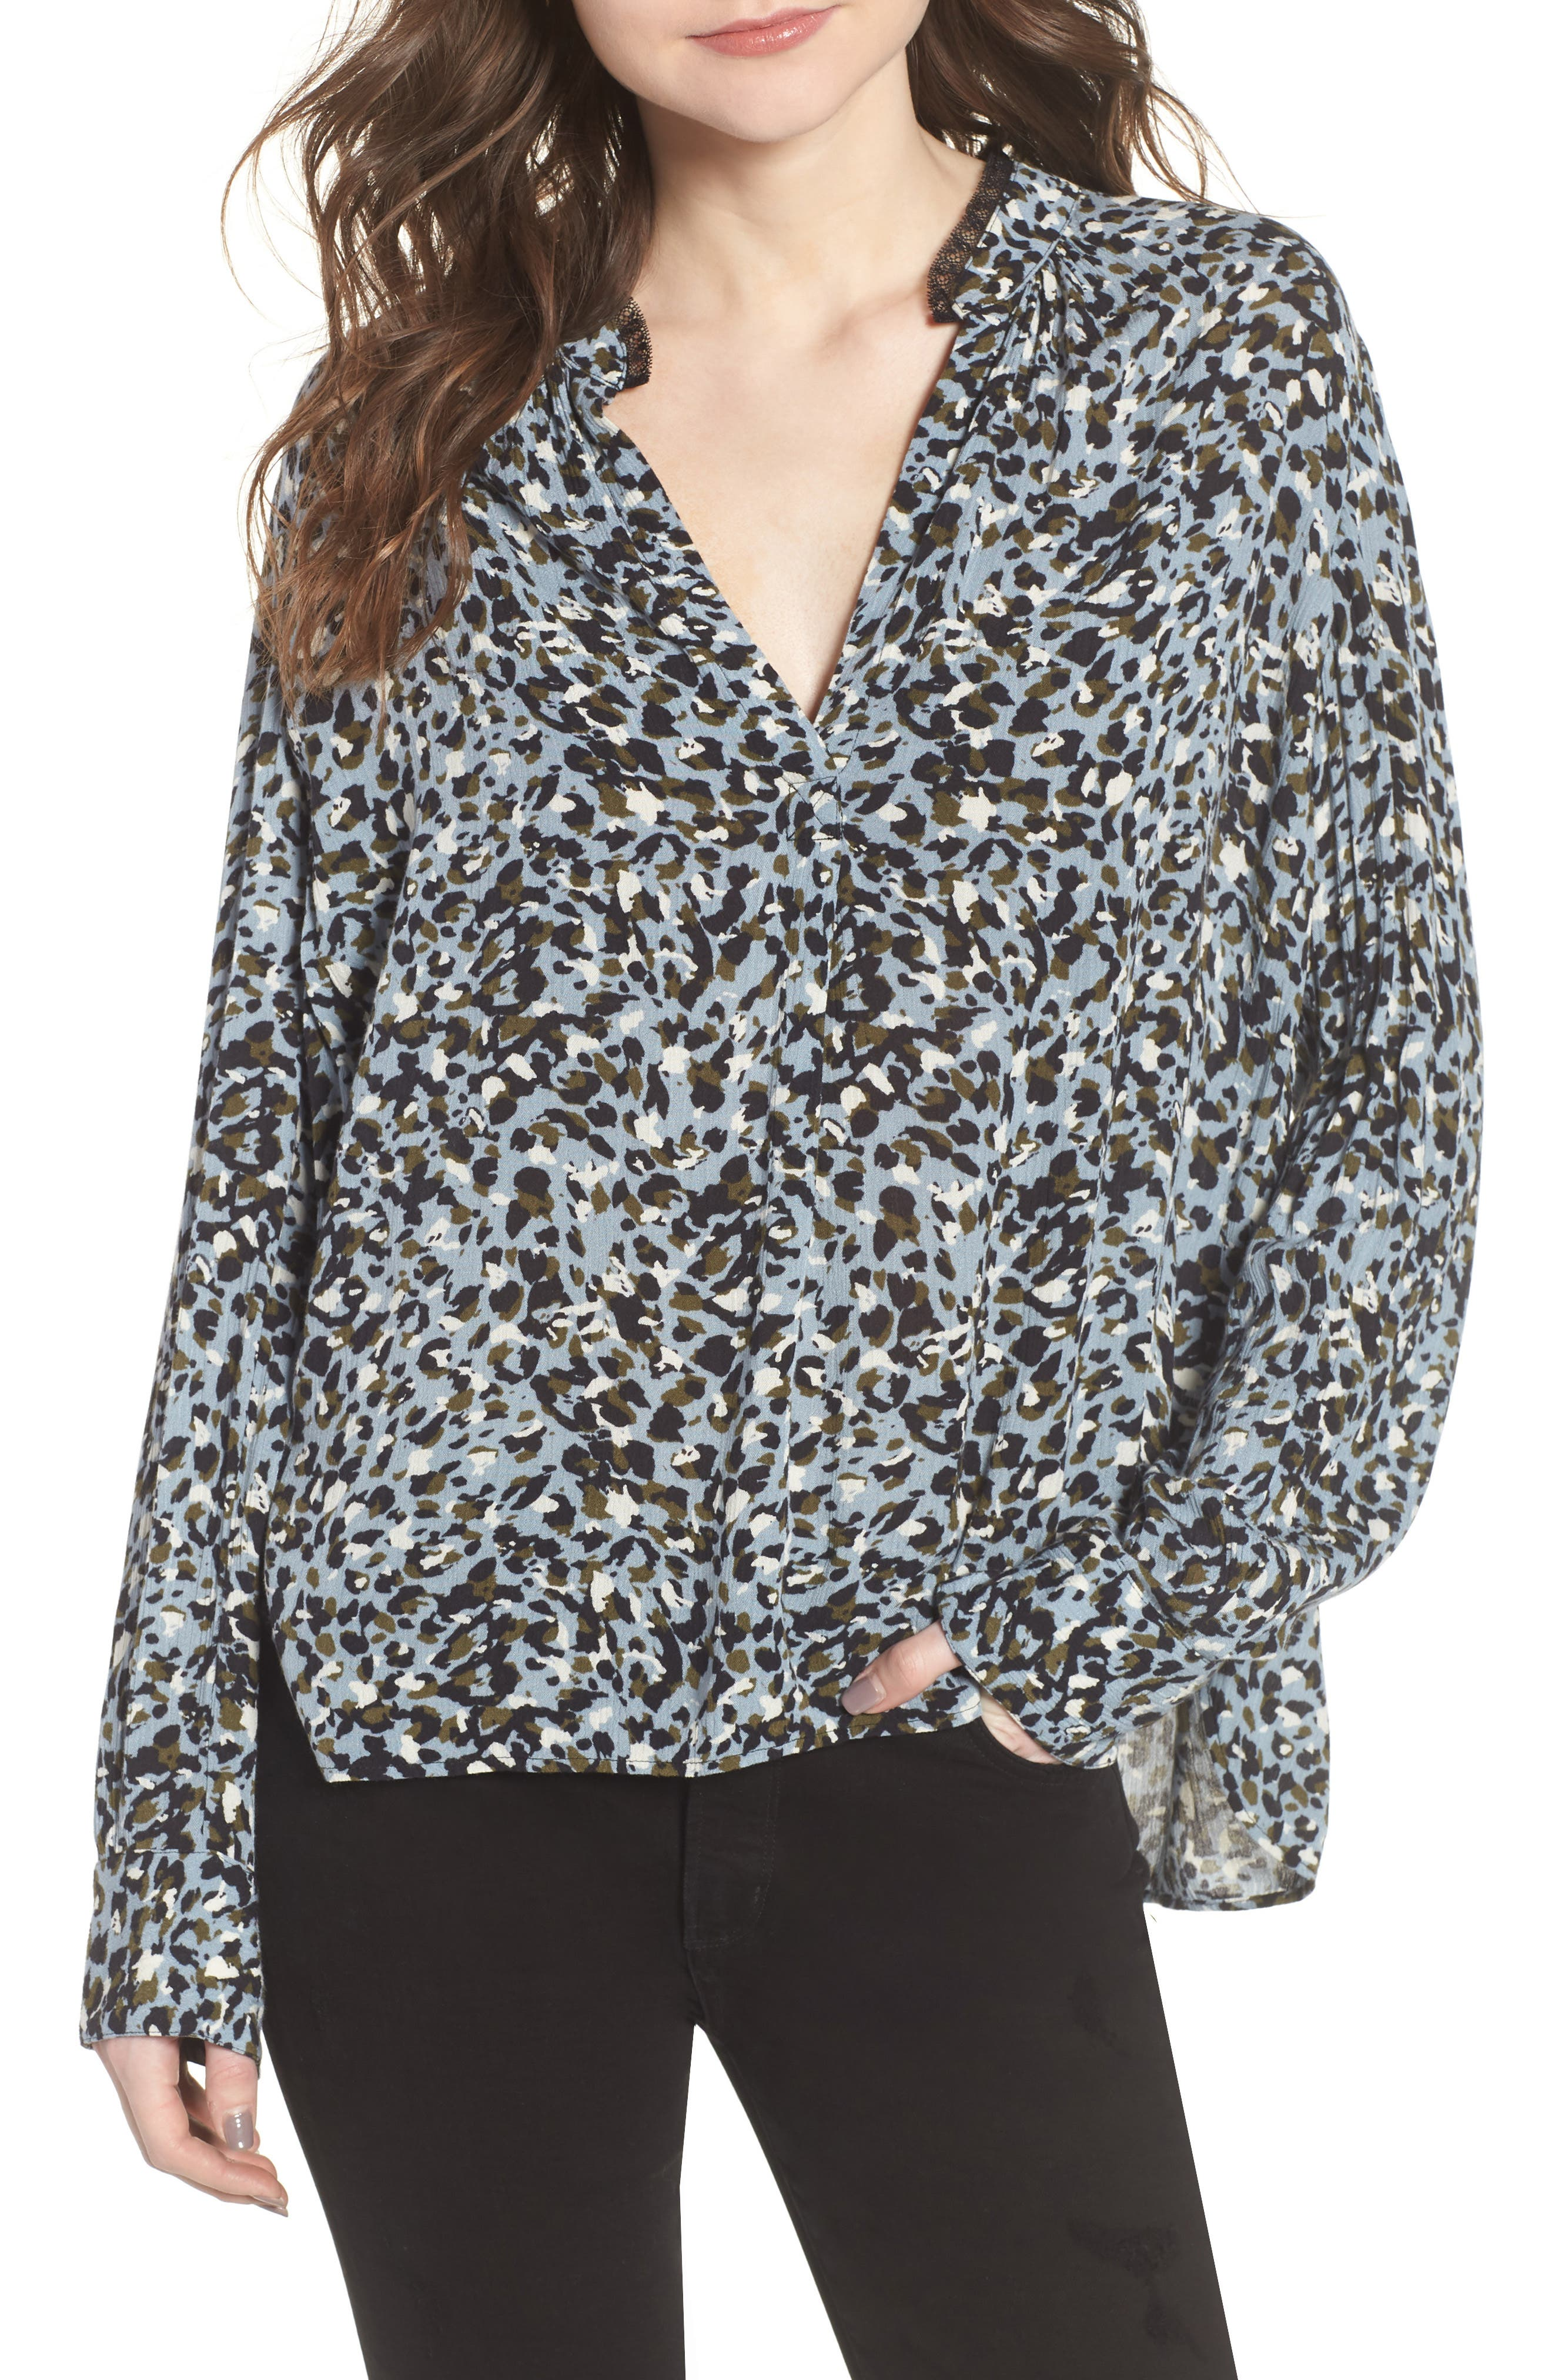 Tink Leopard Print Top,                         Main,                         color,